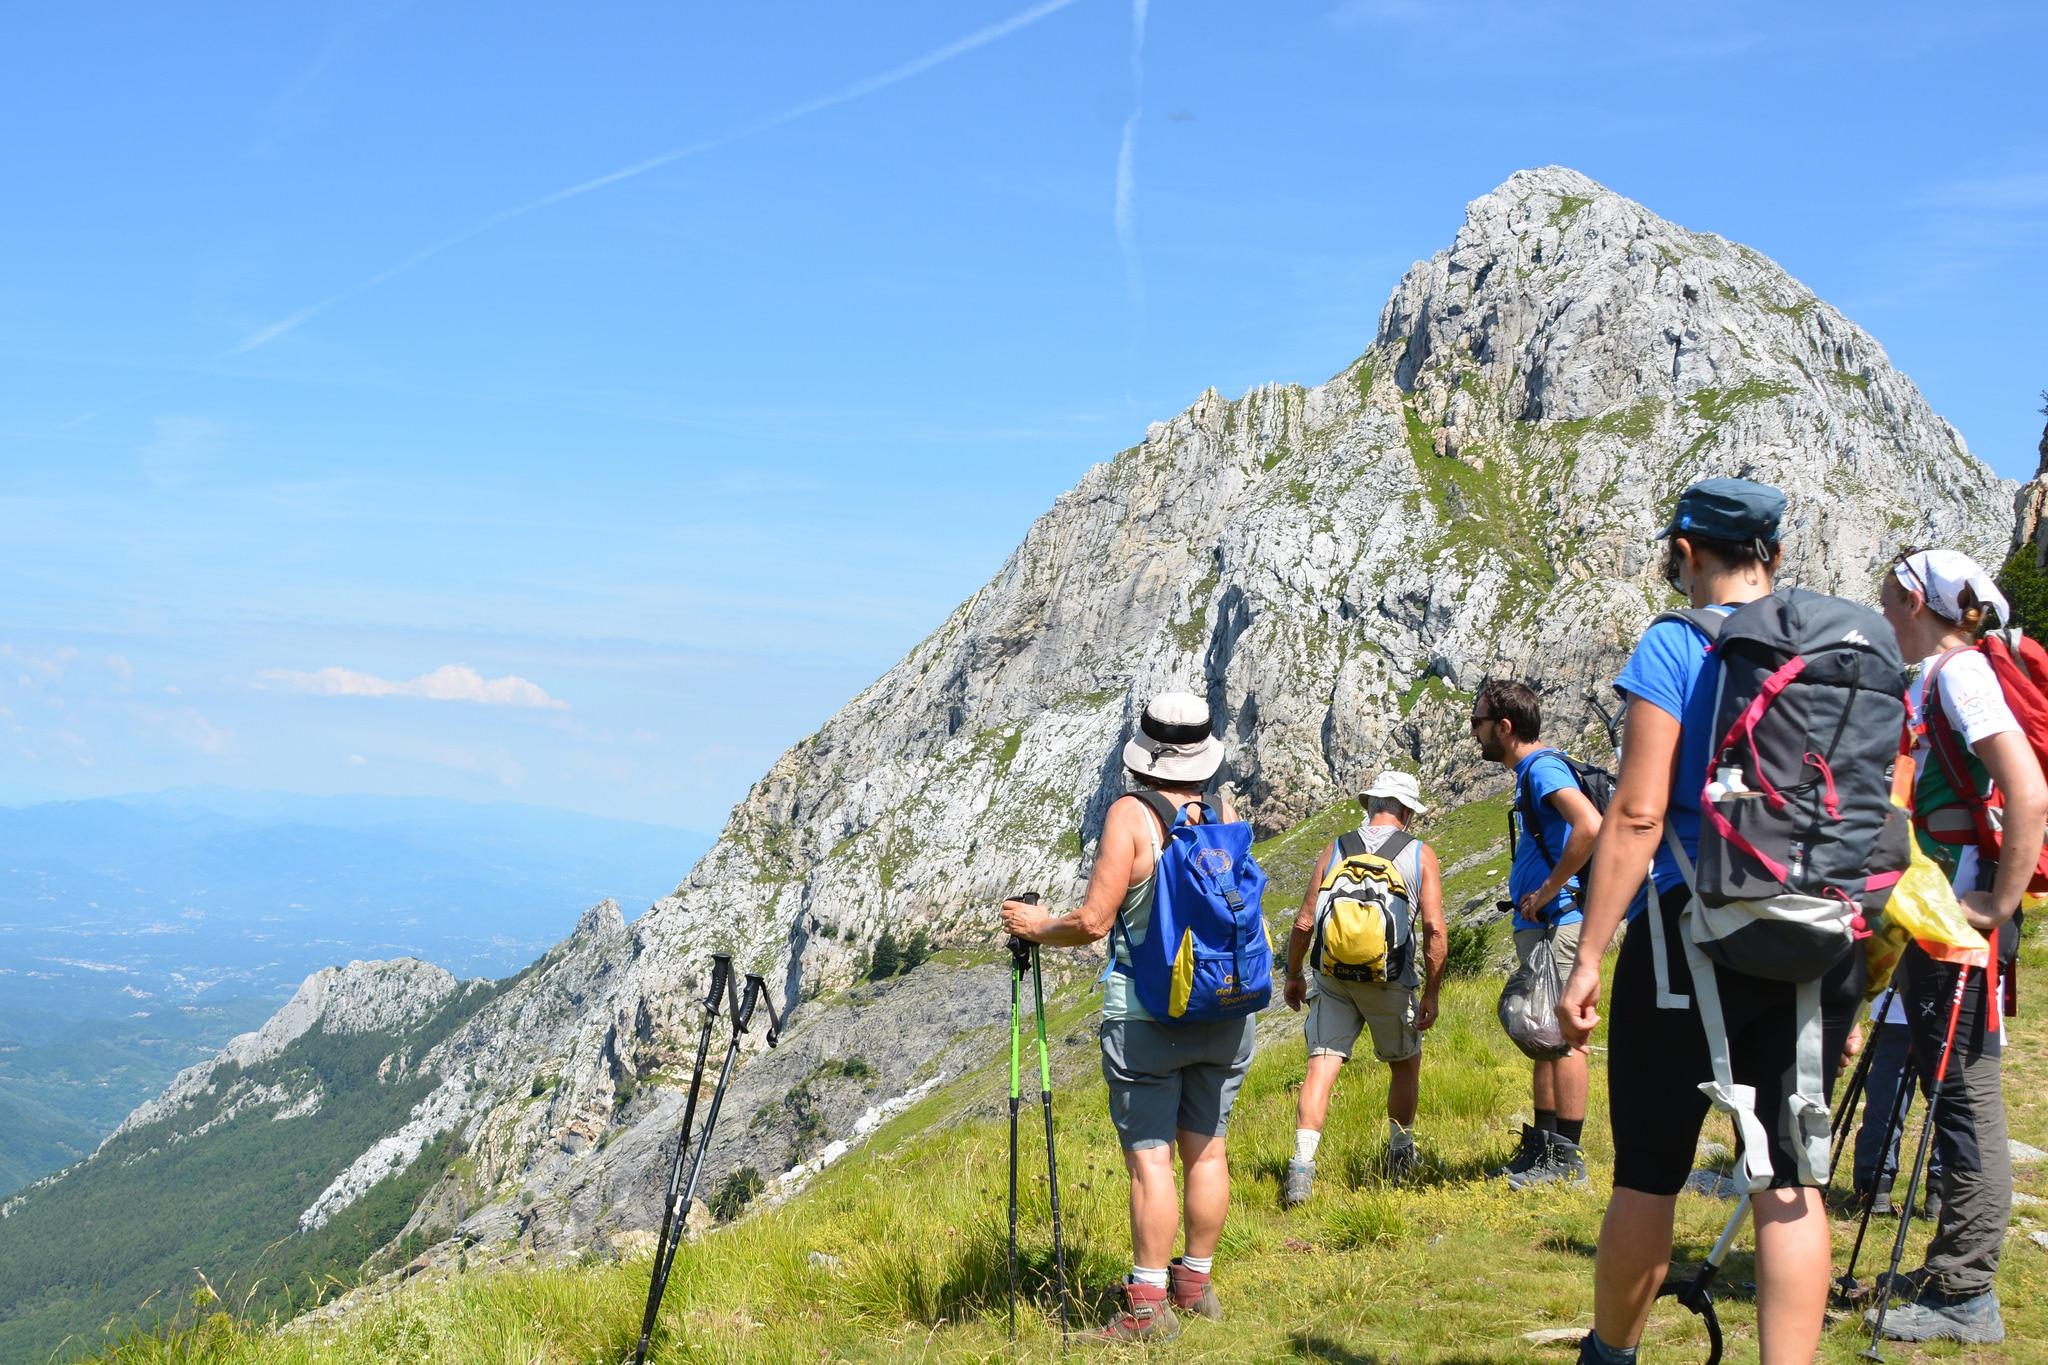 cai, montagna, escursionismo